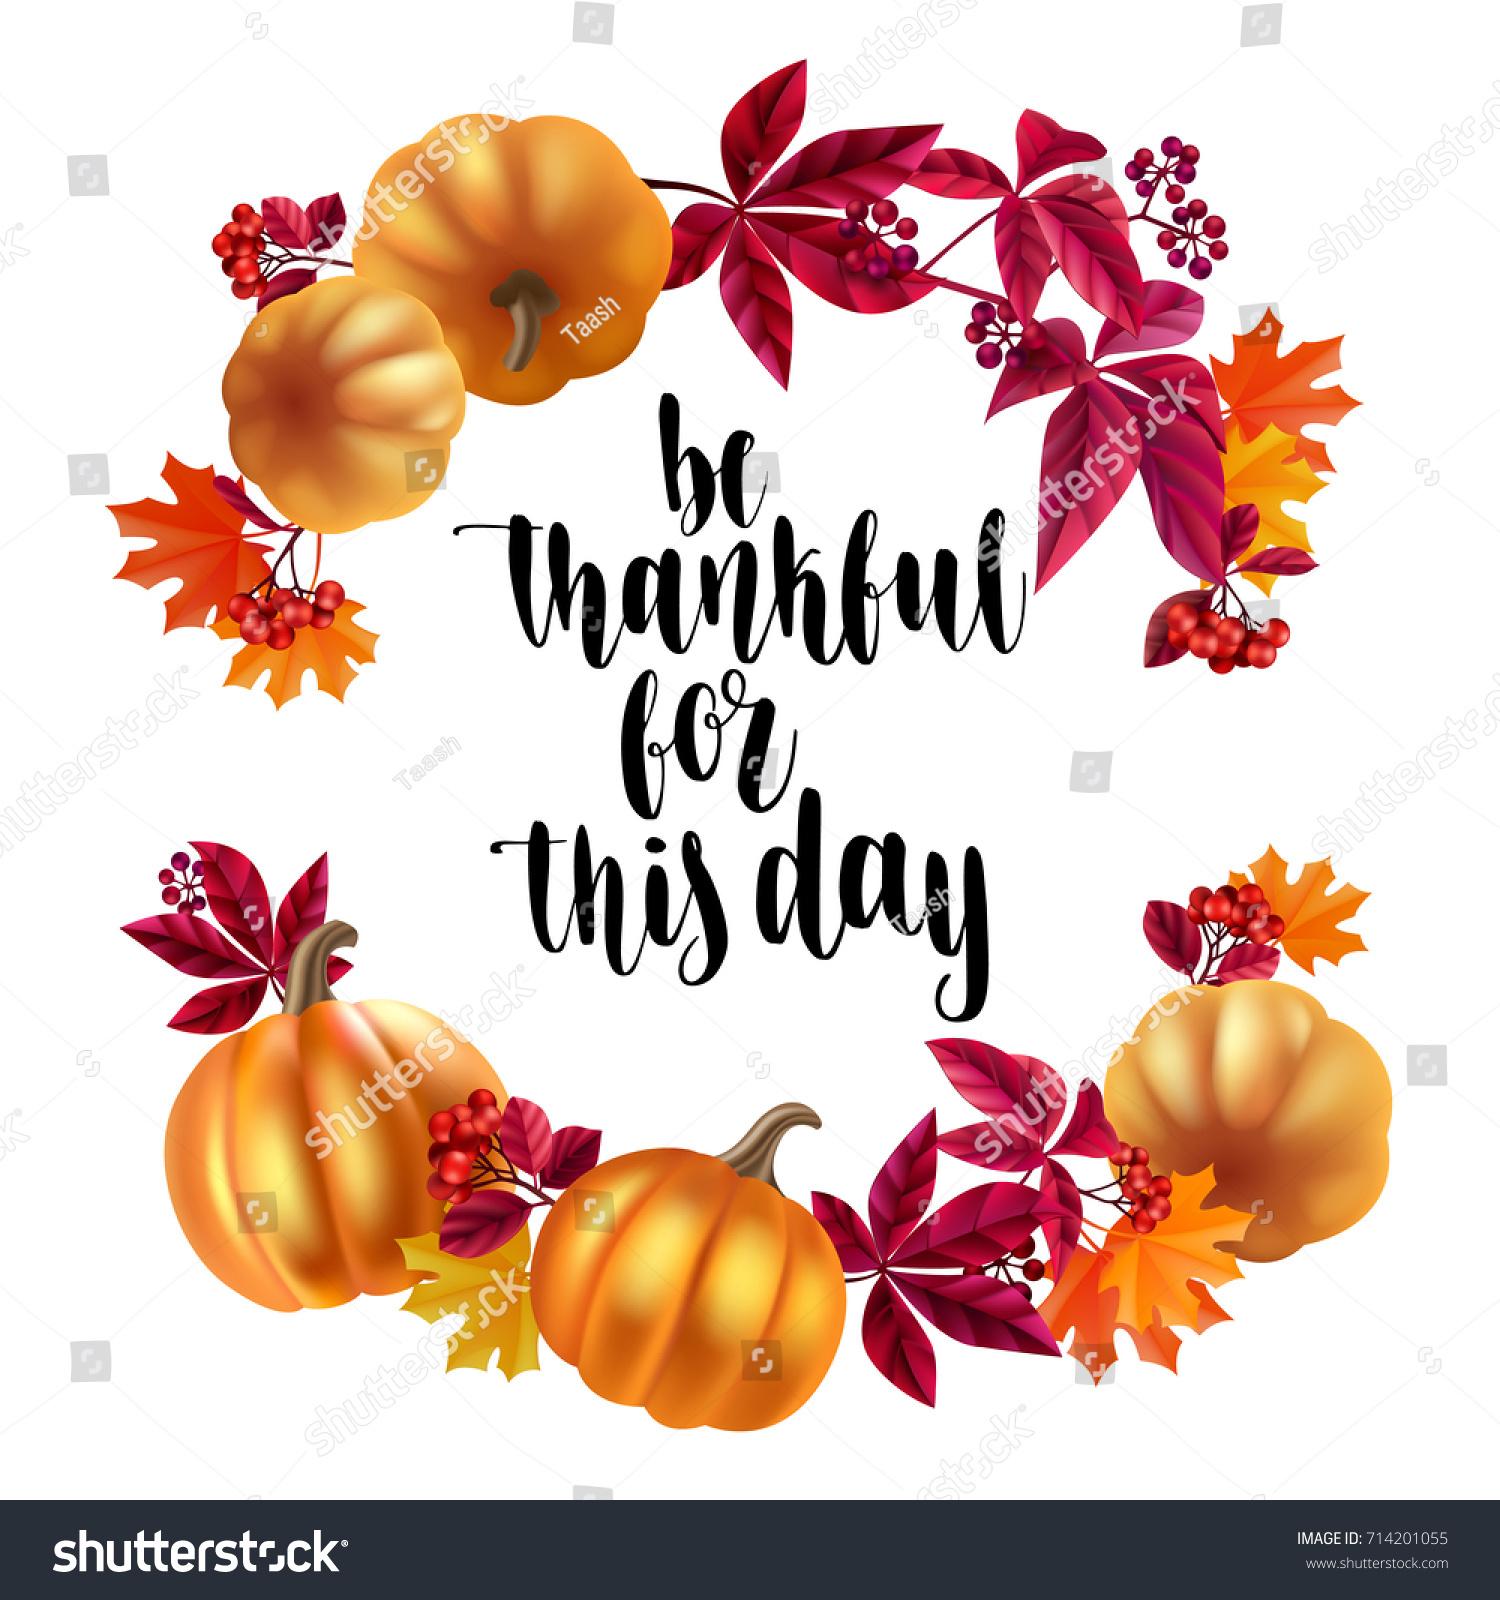 Thanksgiving Greeting Card Handwritten Brush Calligraphy And Autumn